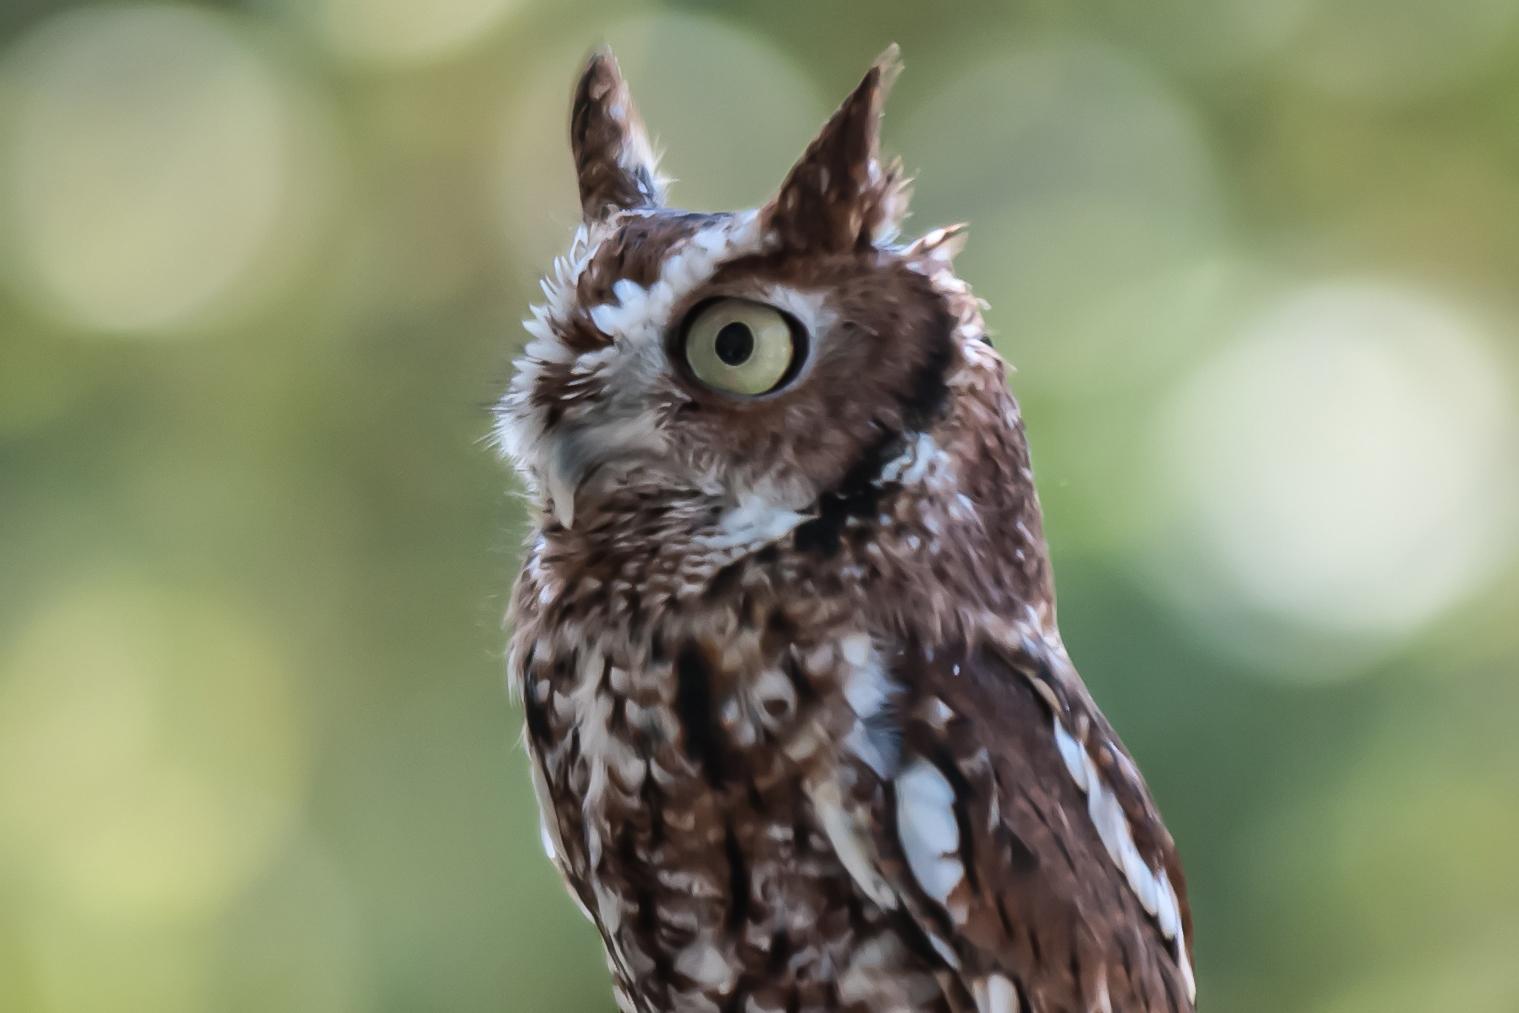 Mini owl, Adult, Raptor, Owl, Perching, HQ Photo